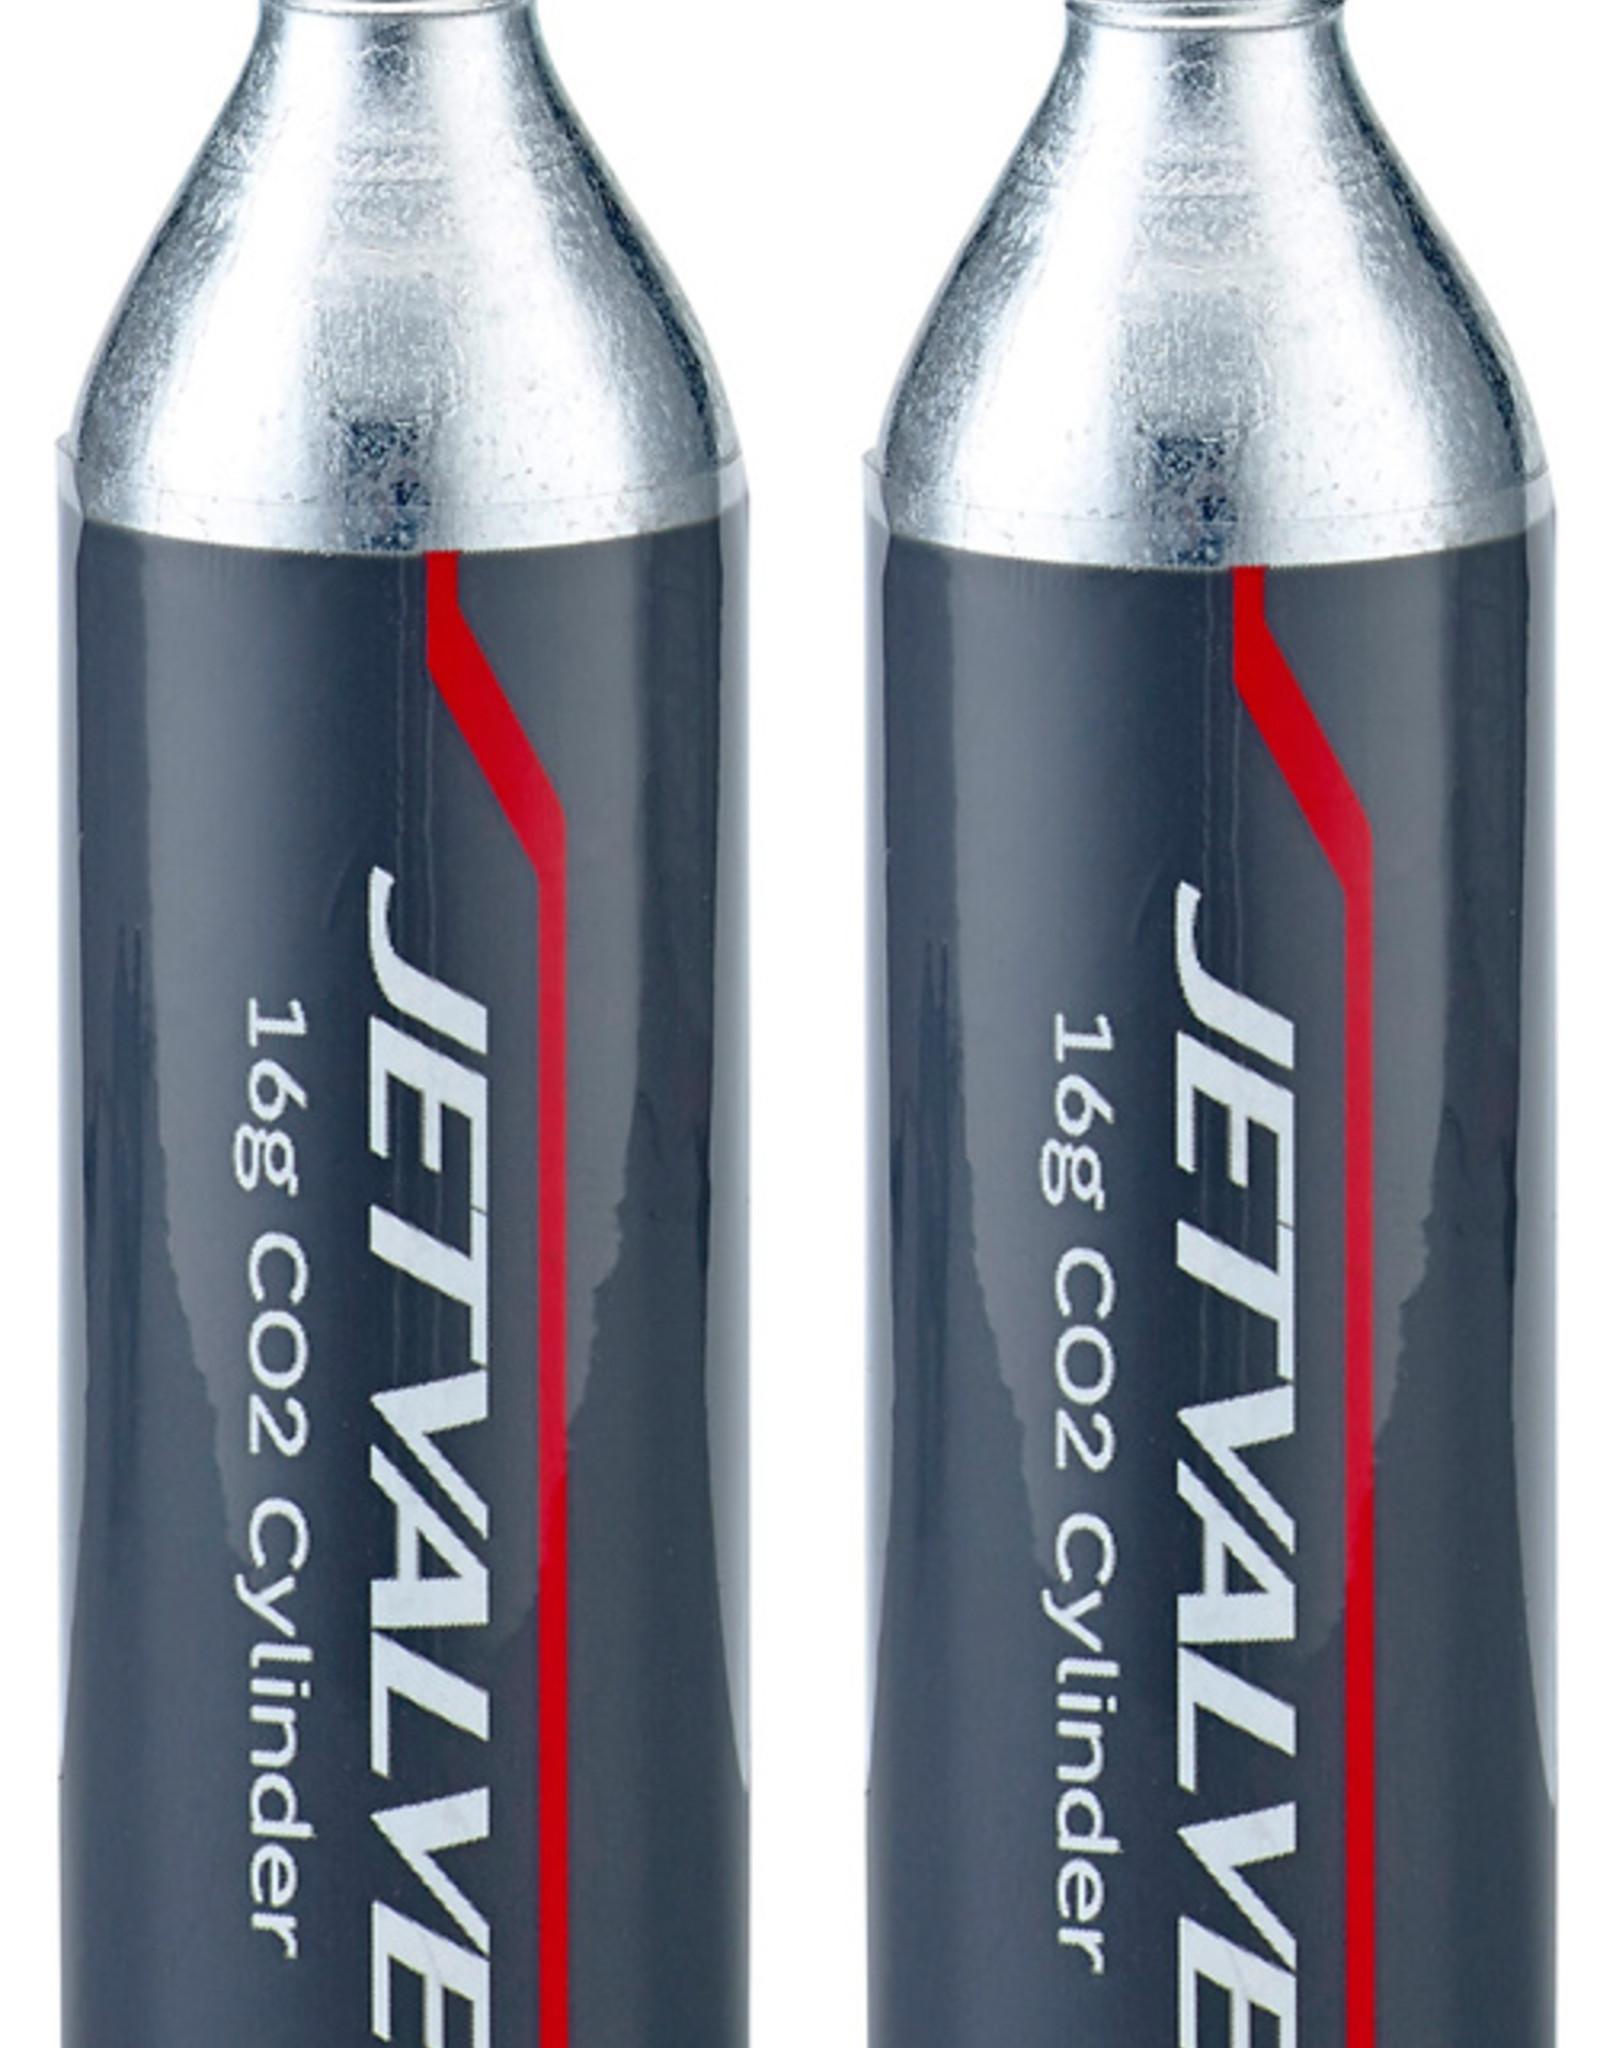 Weldtite Jet Valve CO2 Cylinders 16g (Pack of 2)